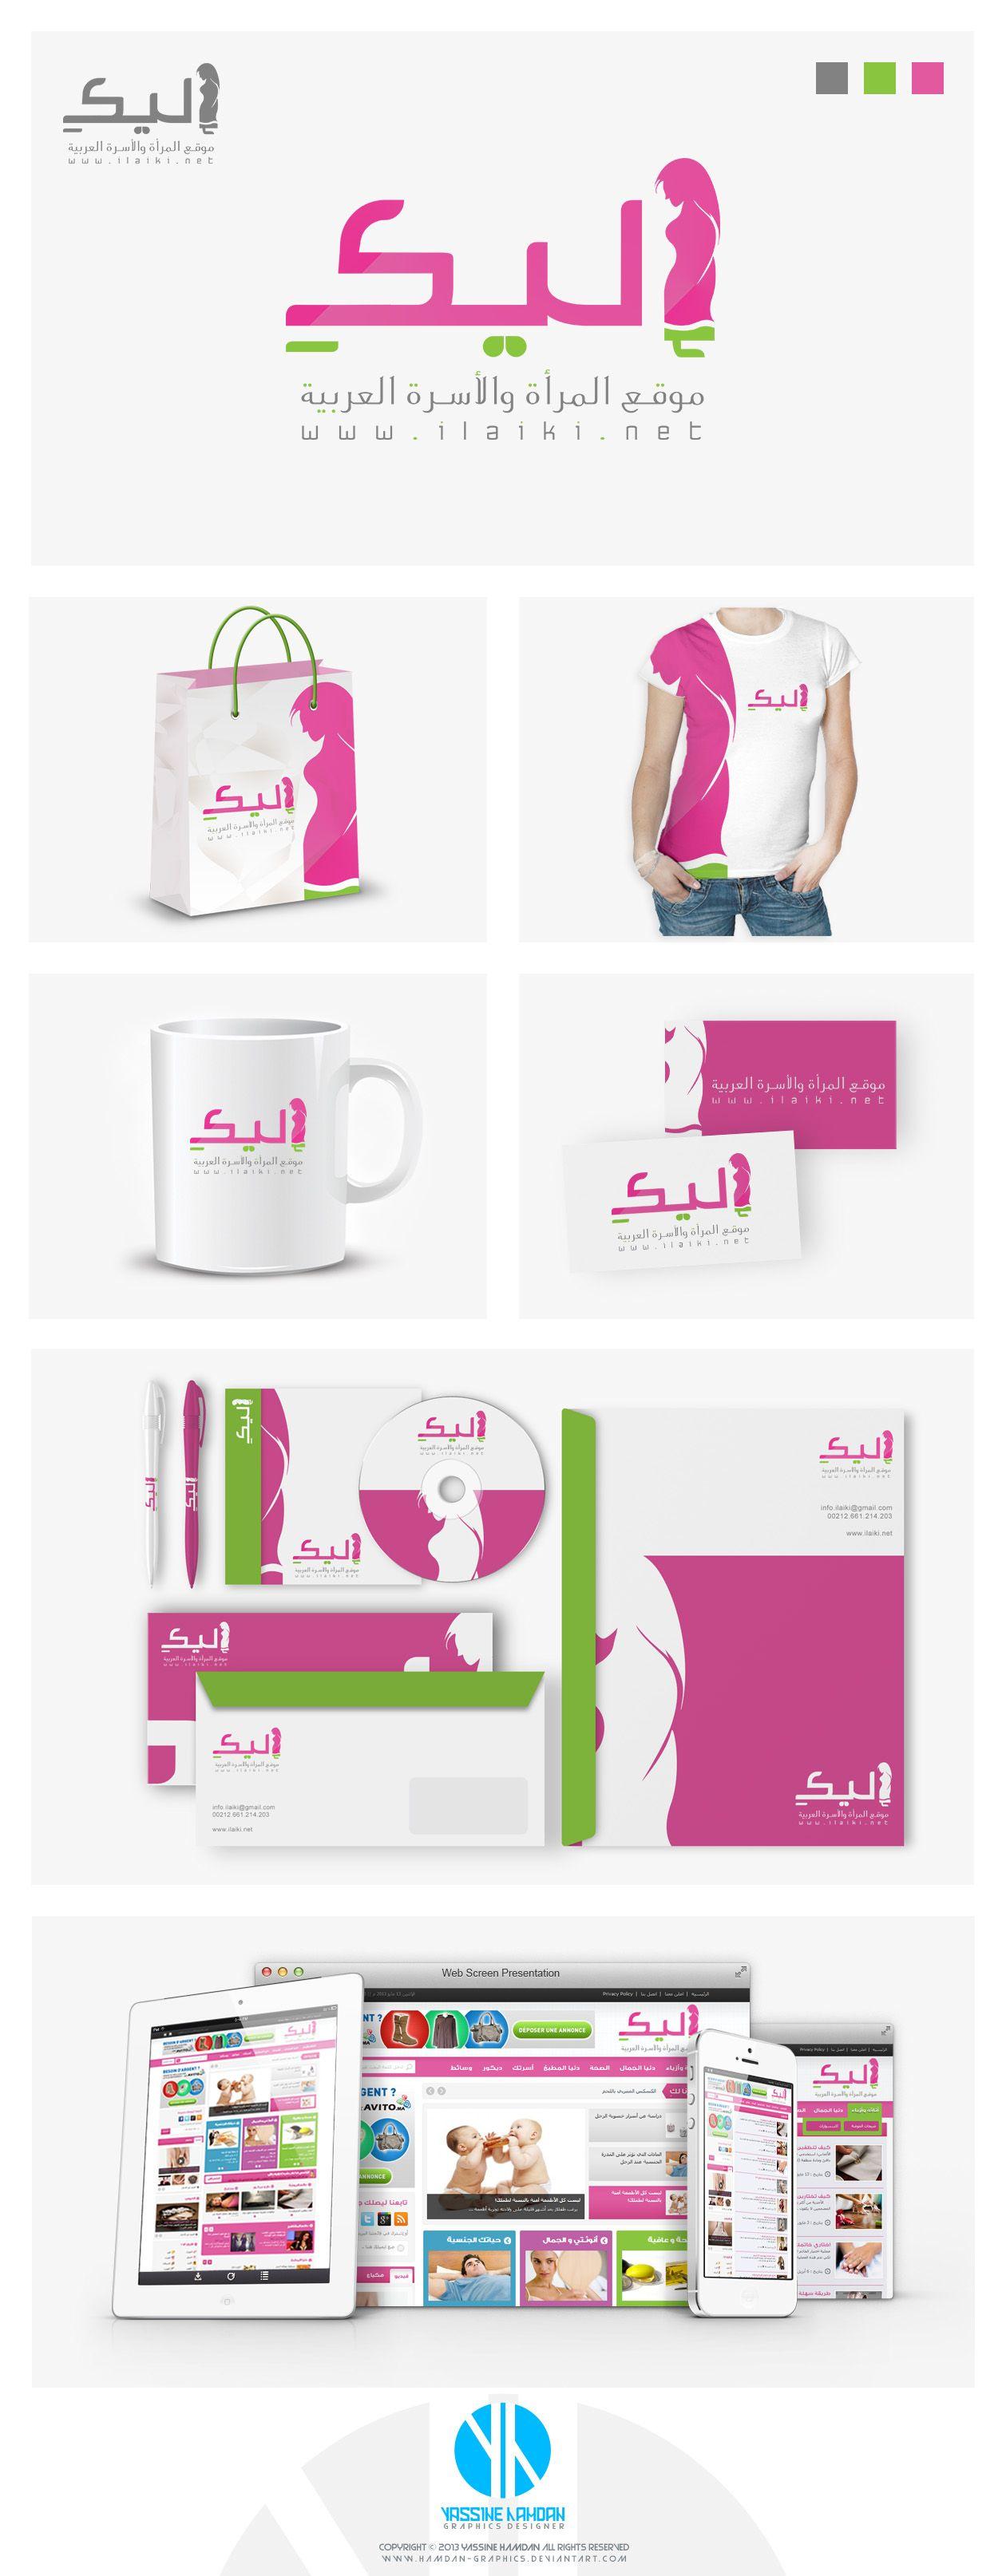 Ilaiki.Net Logo Design by Hamdan-Graphics.deviantart.com on @deviantART